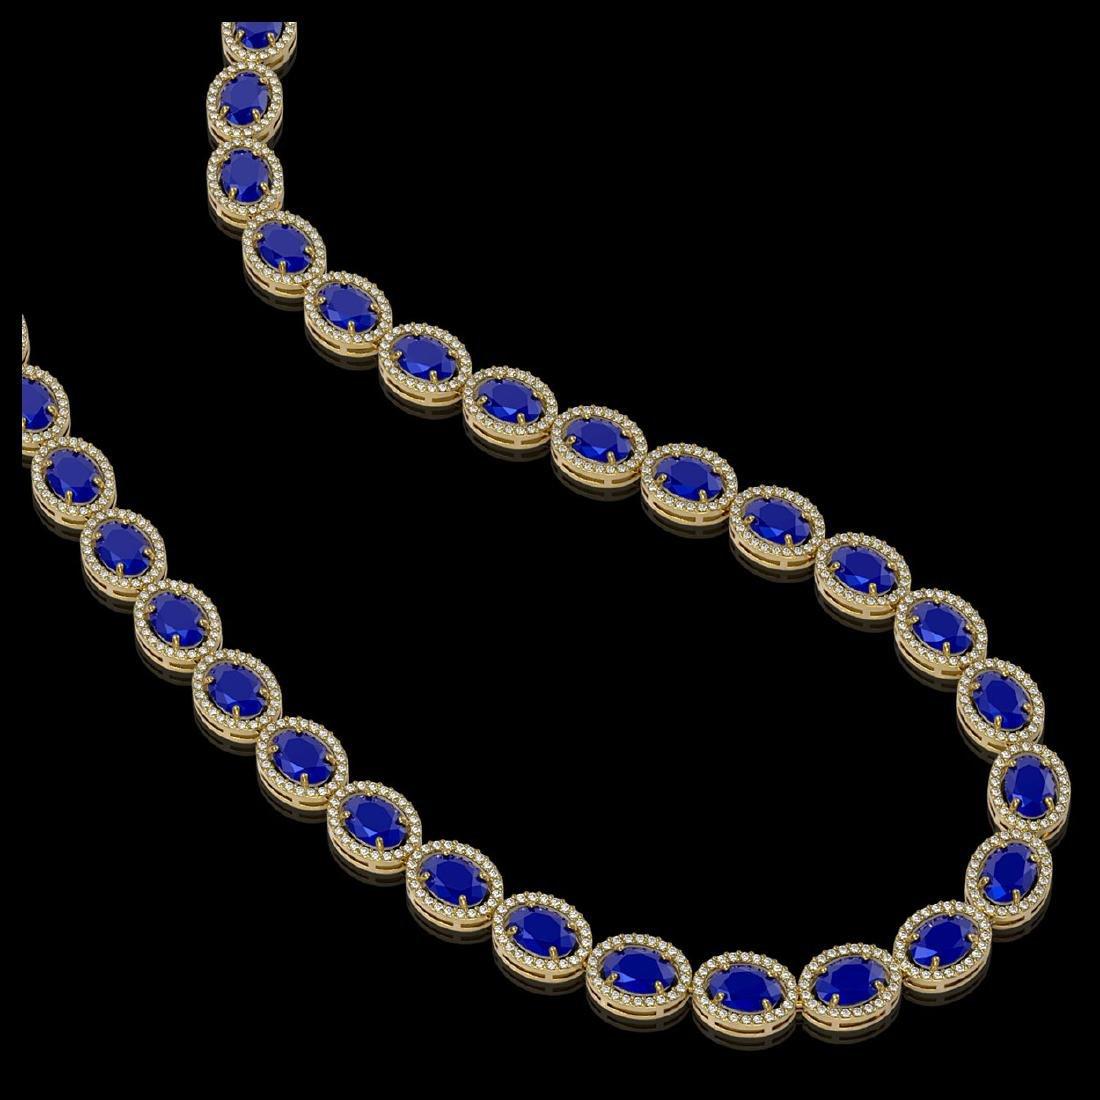 52.15 CTW Sapphire & Diamond Halo Necklace 10K Yellow - 2